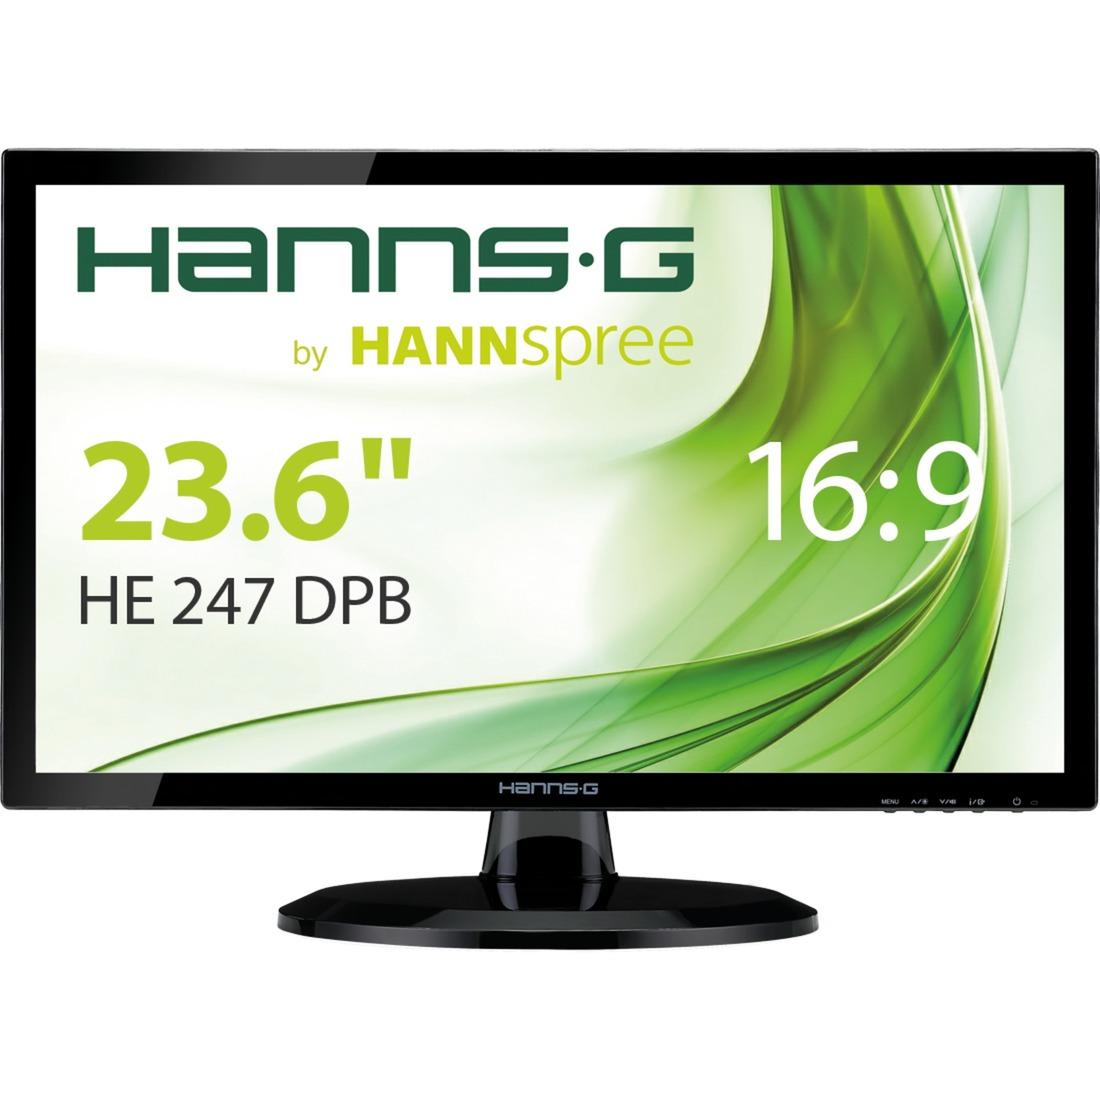 Hanns.G HE247DPB 23.6